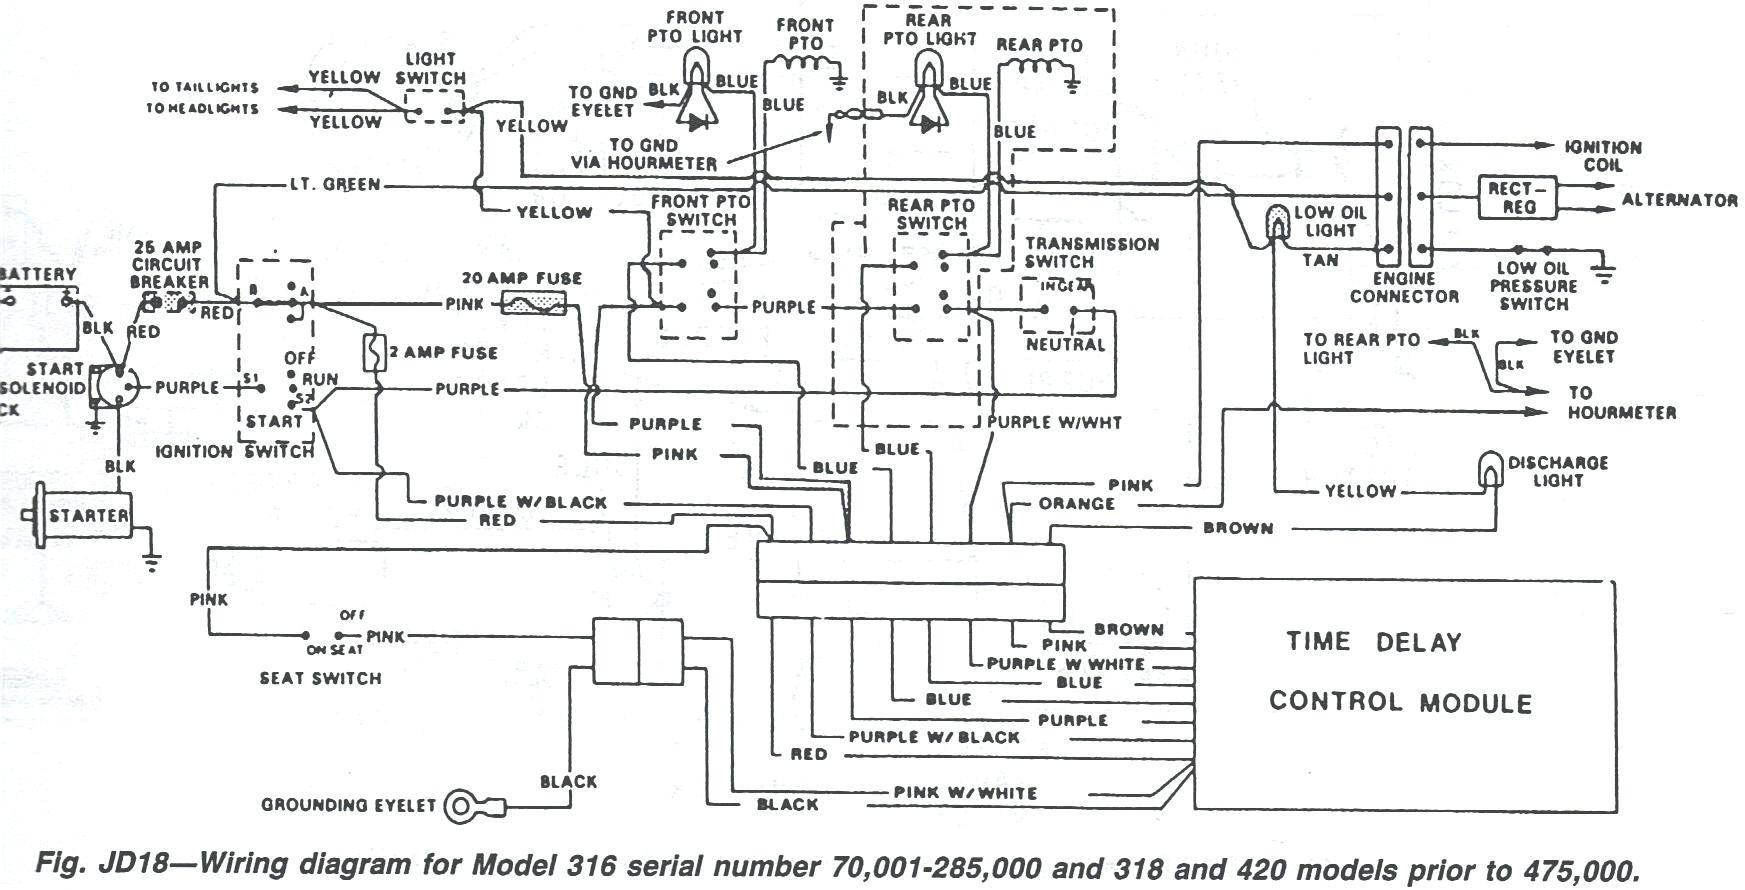 139 Srt Wiring Diagram